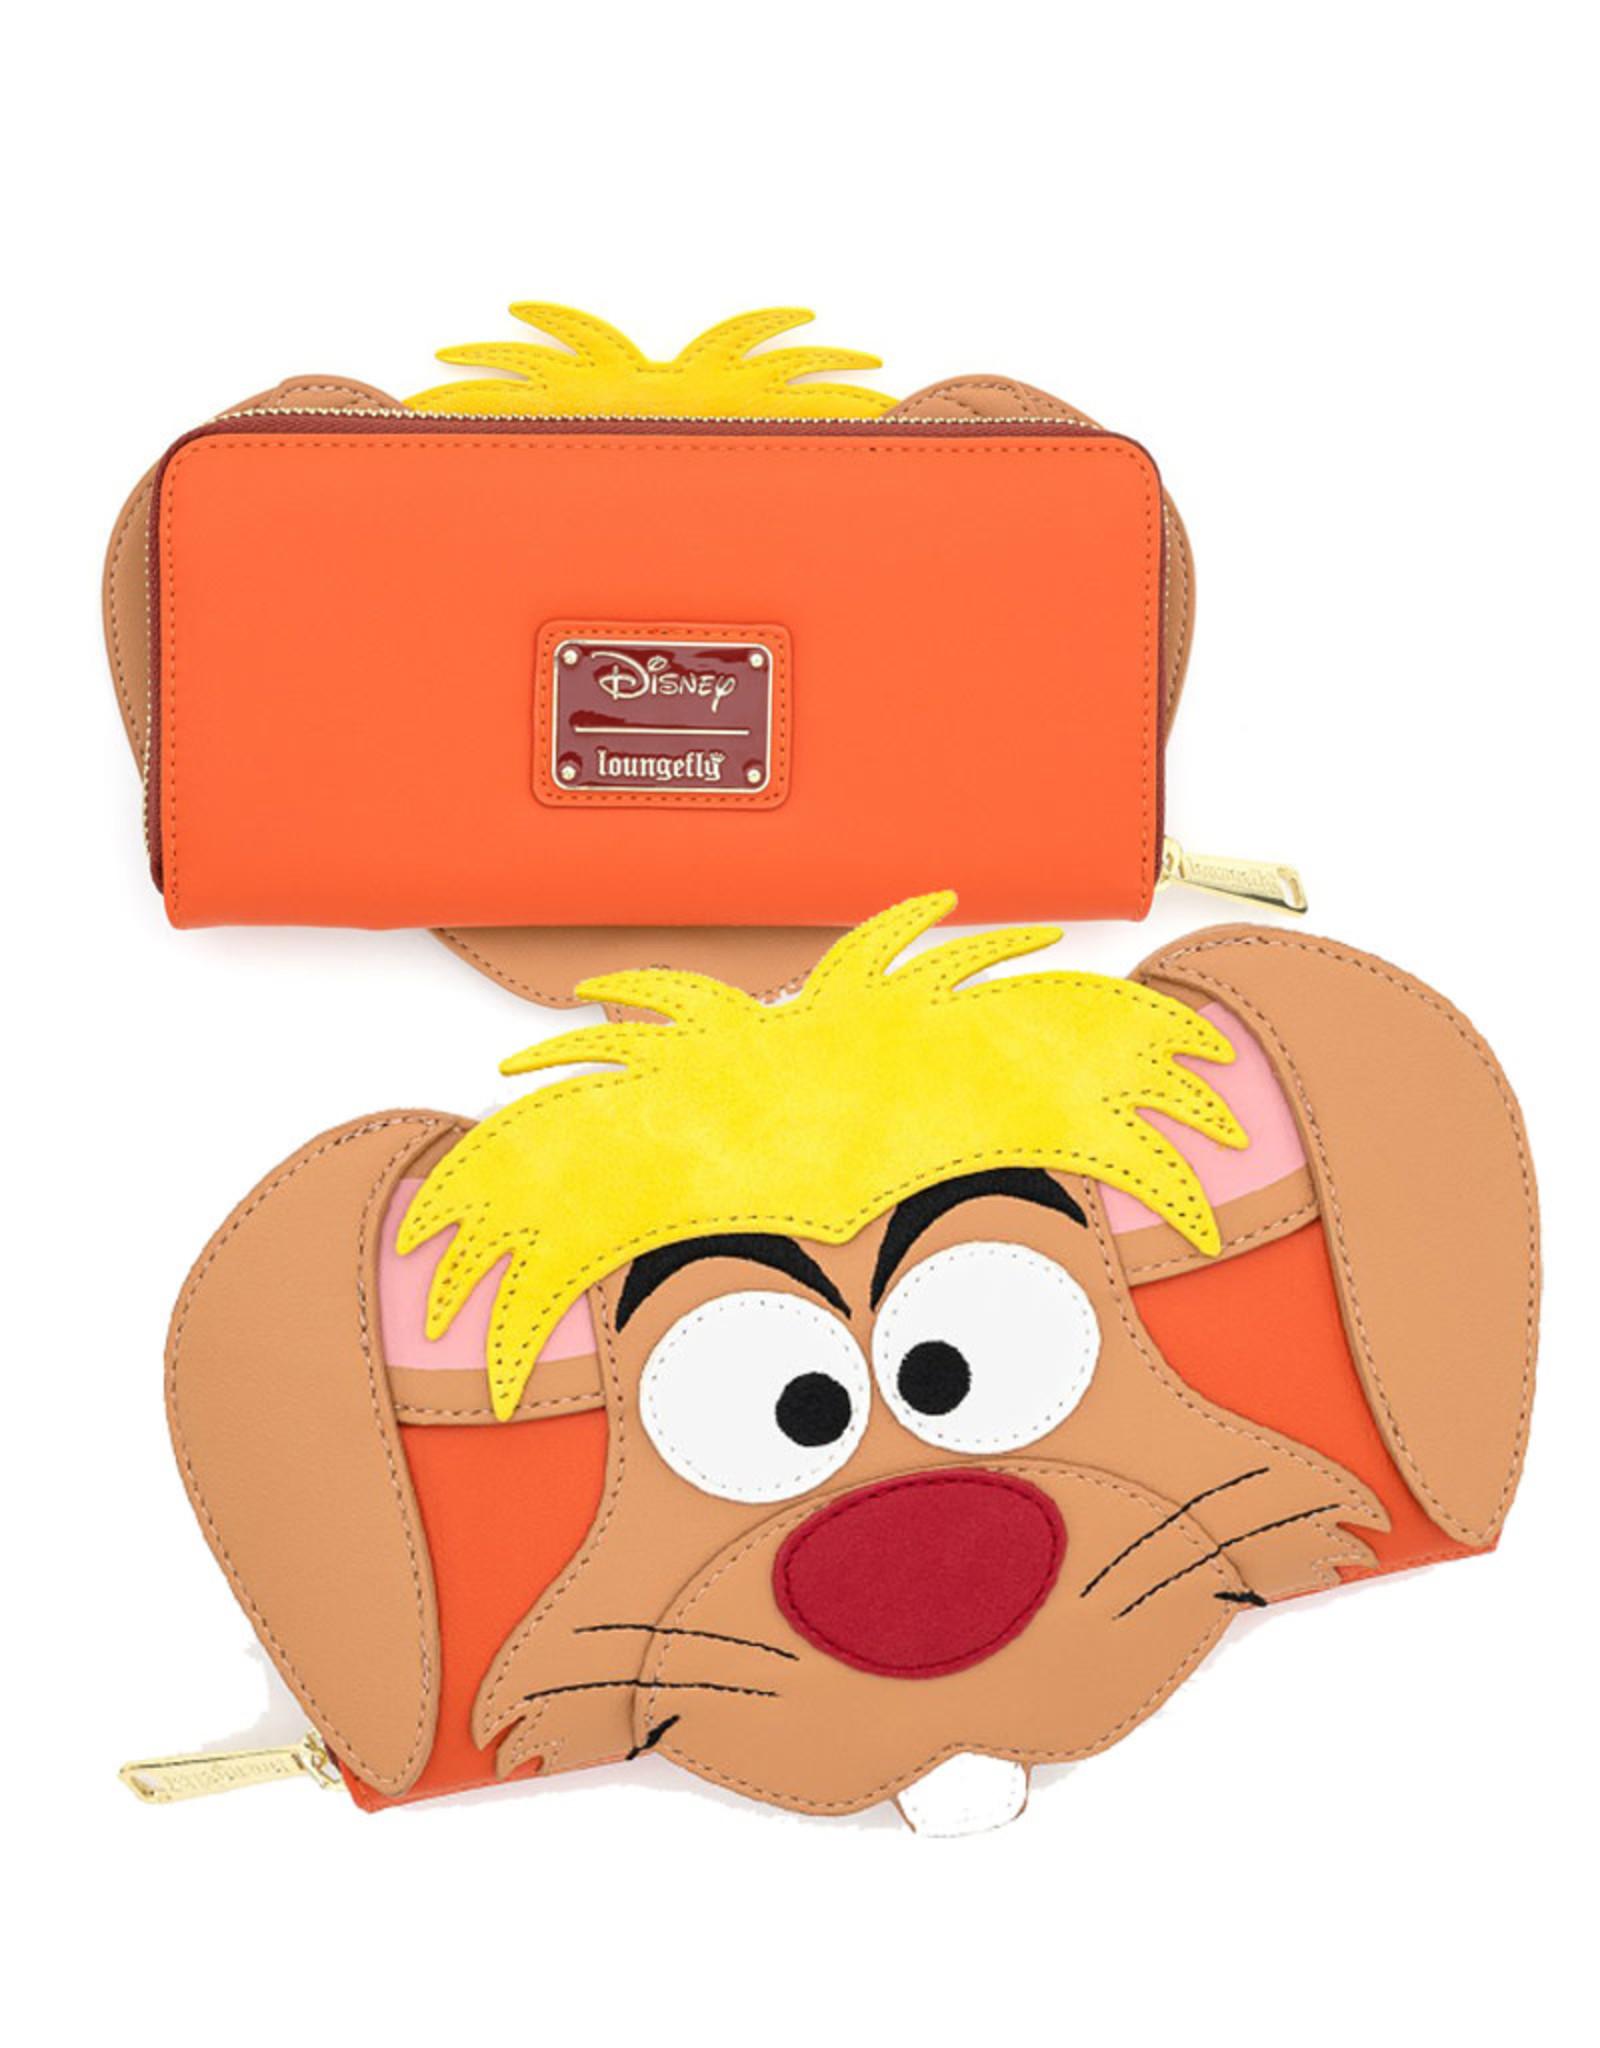 Disney Disney ( Loungefly Wallet ) Alice Rabbit